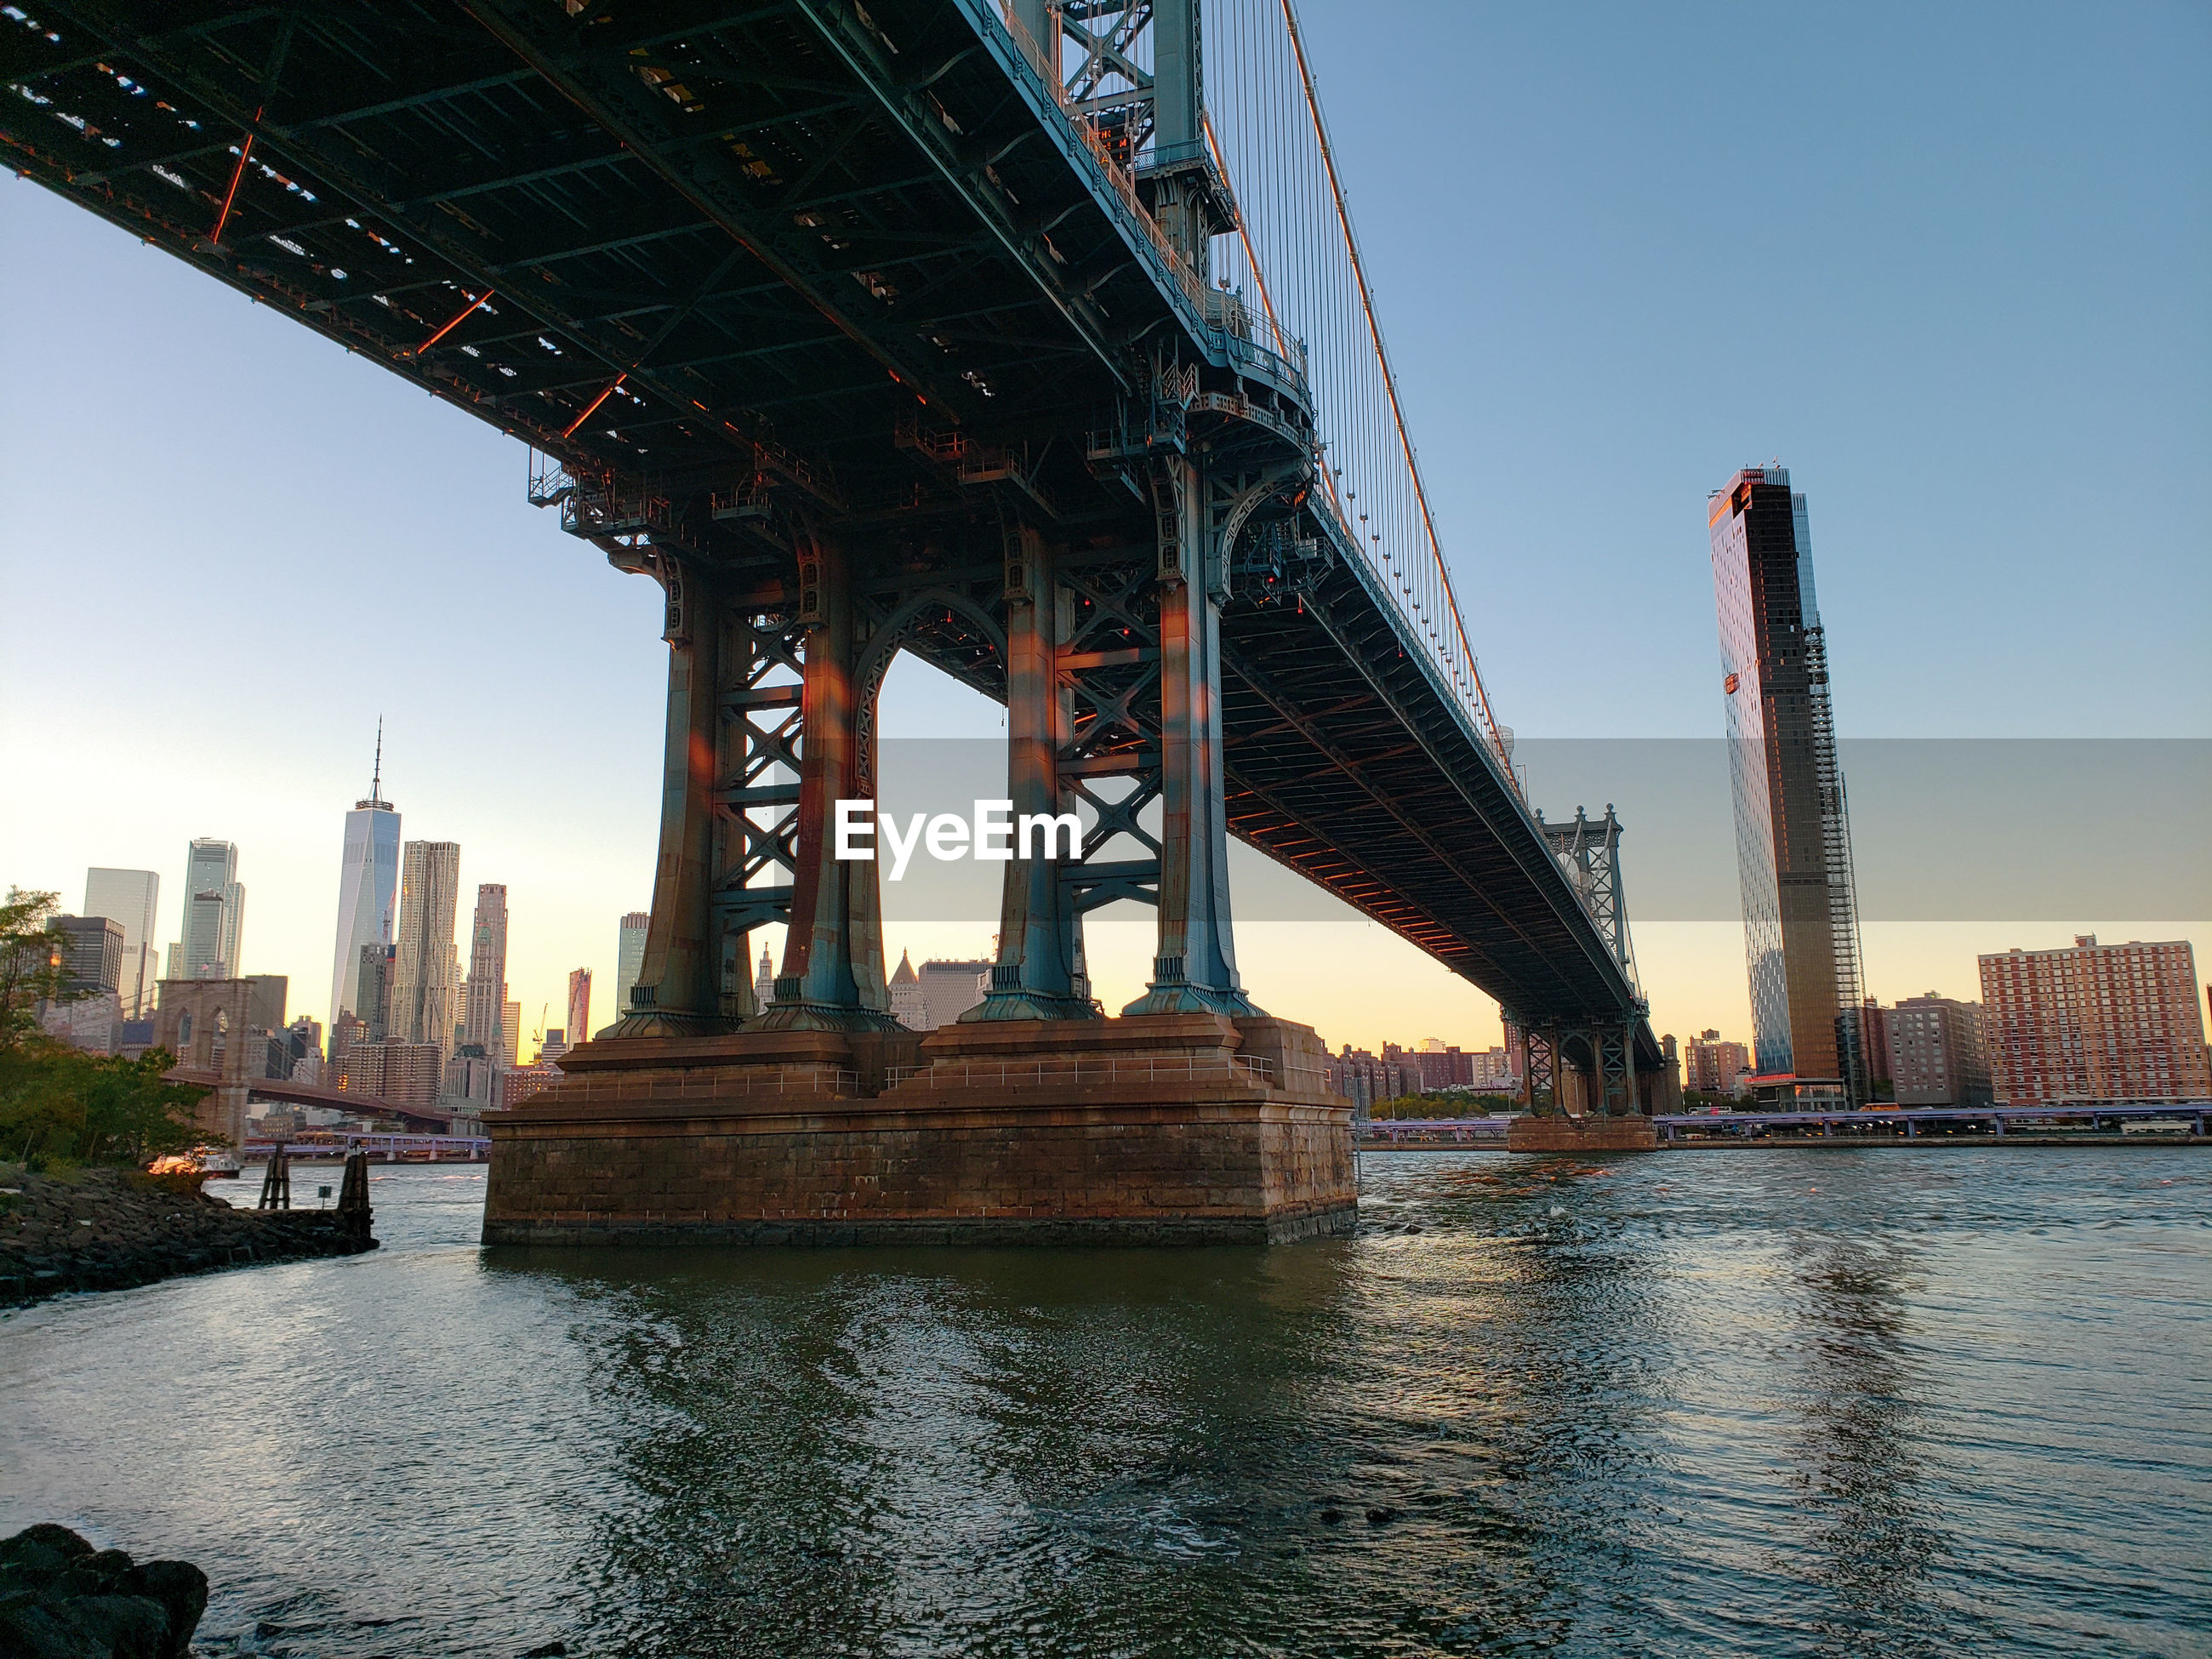 VIEW OF BRIDGE OVER RIVER AGAINST BUILDINGS